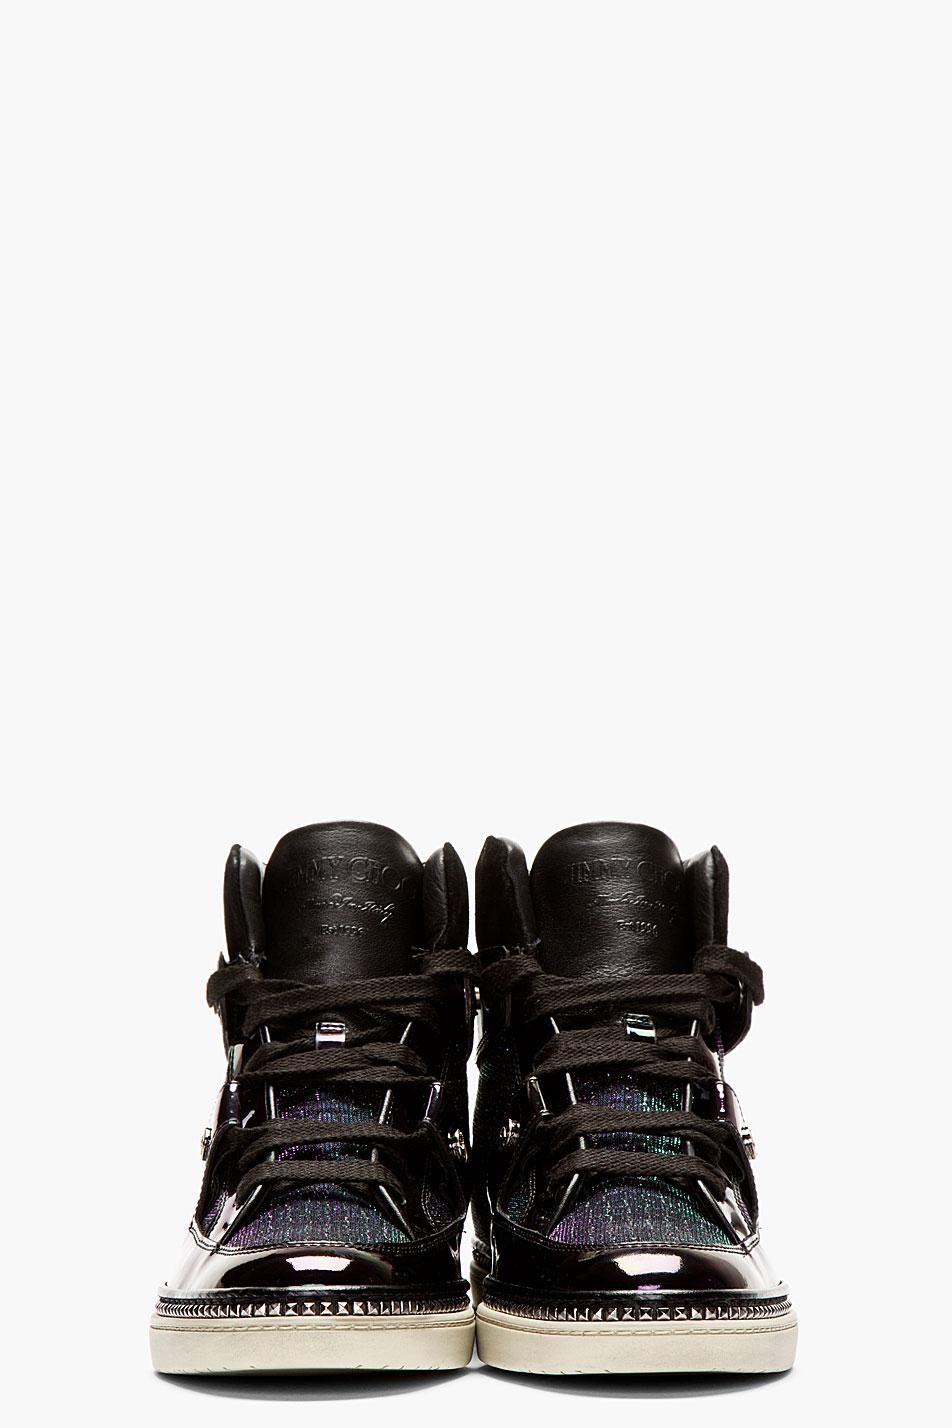 Jimmy Choo Black Iridescent Petrol High-Top Sneakers 2